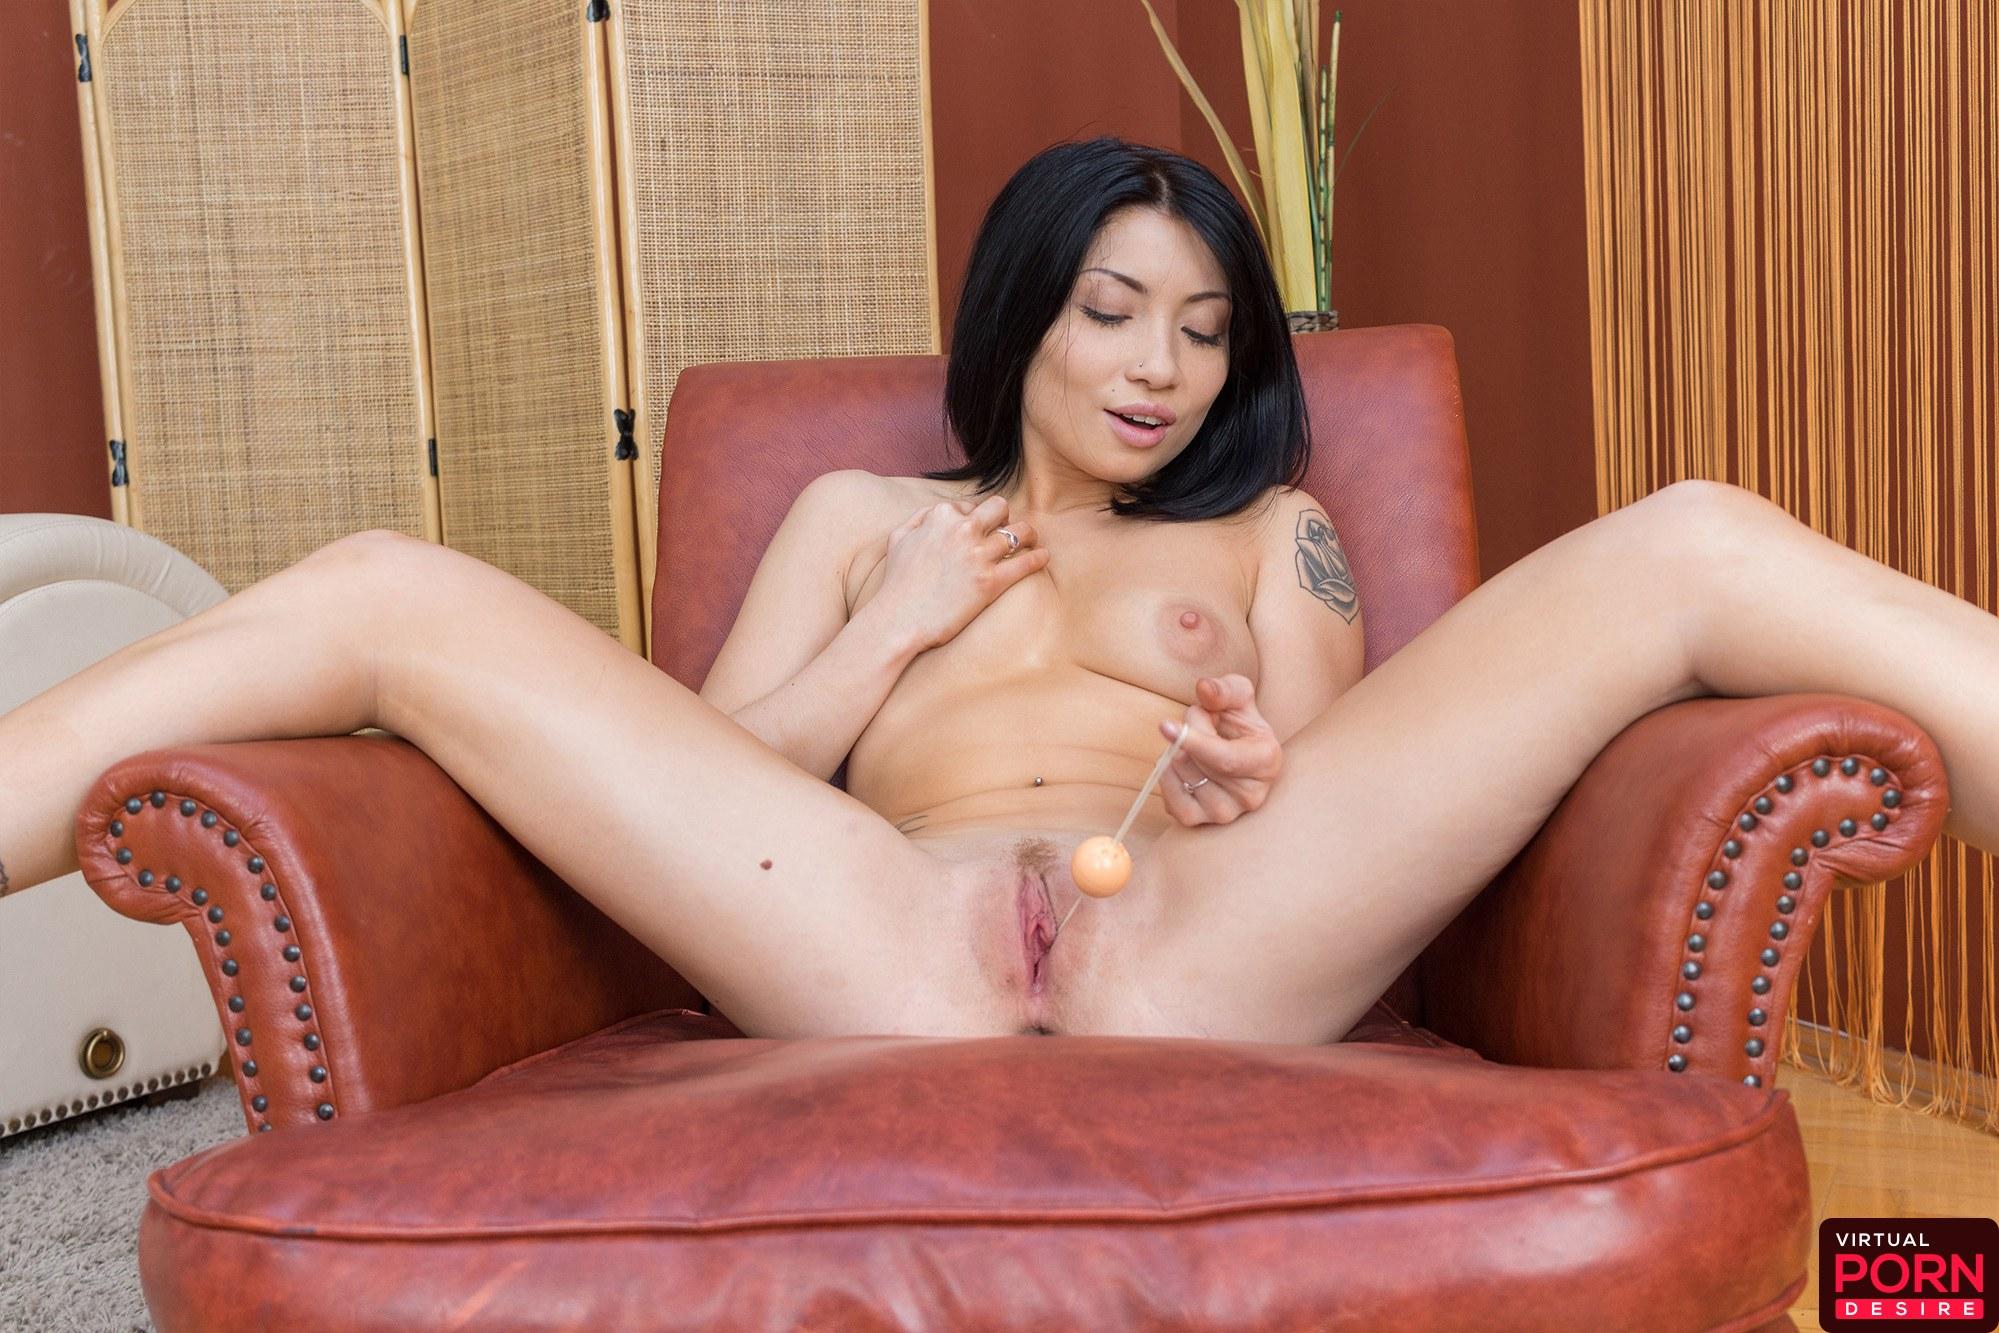 Asian lingerie sex toys dirty talk